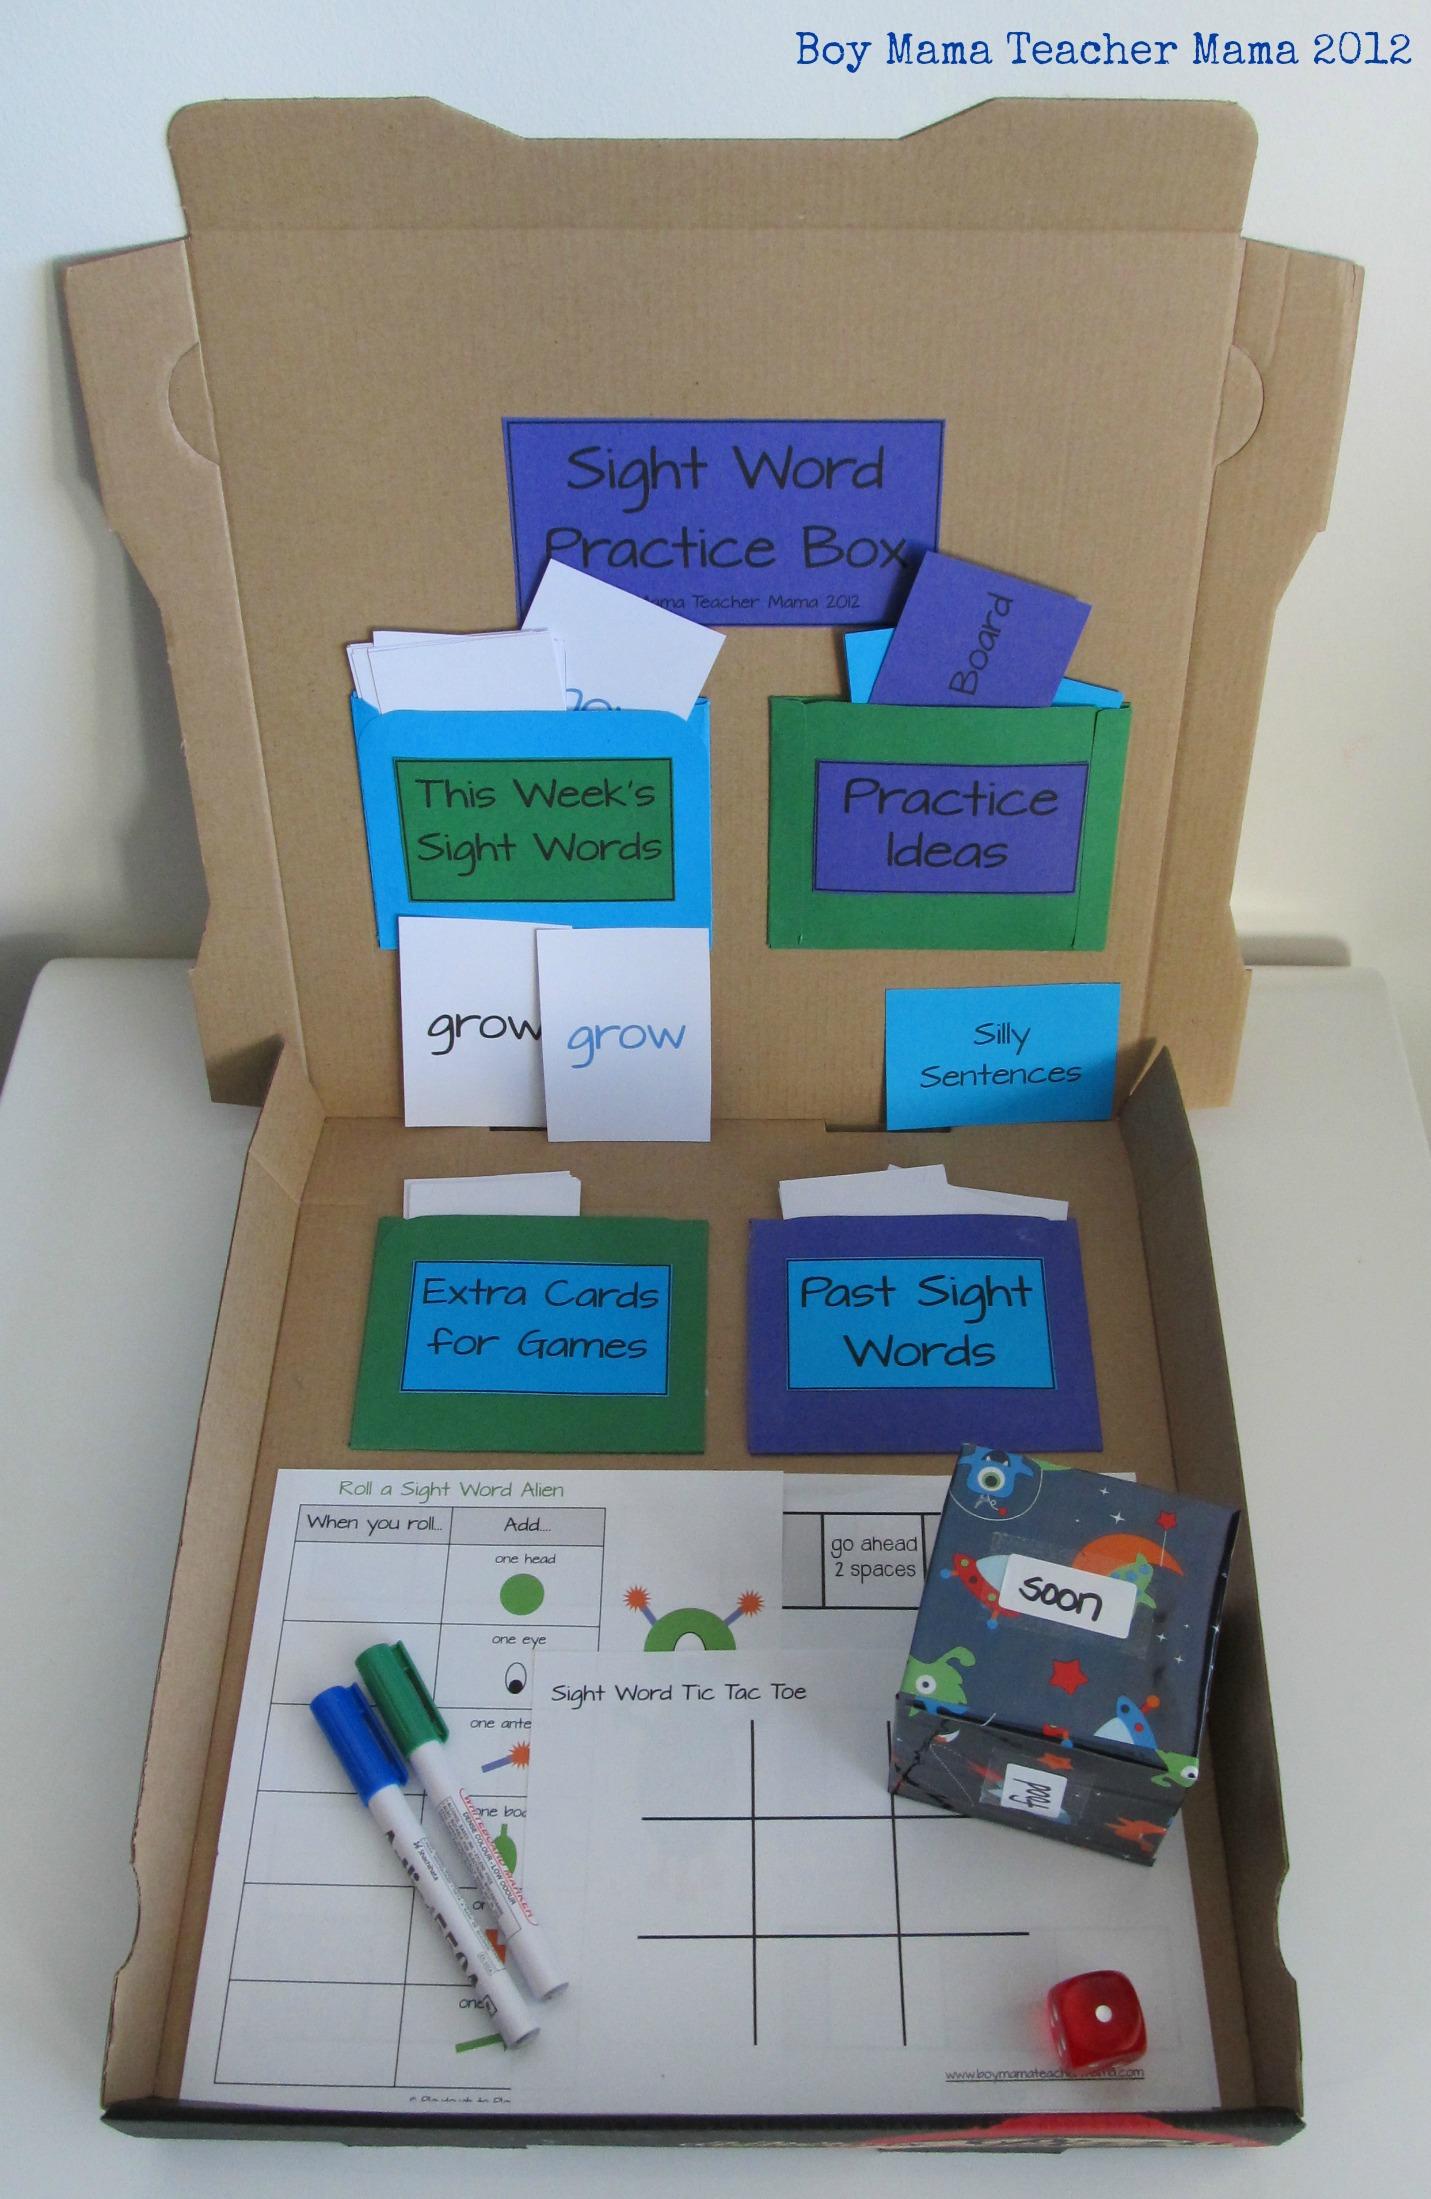 Teacher Mama Sight Word Practice Box